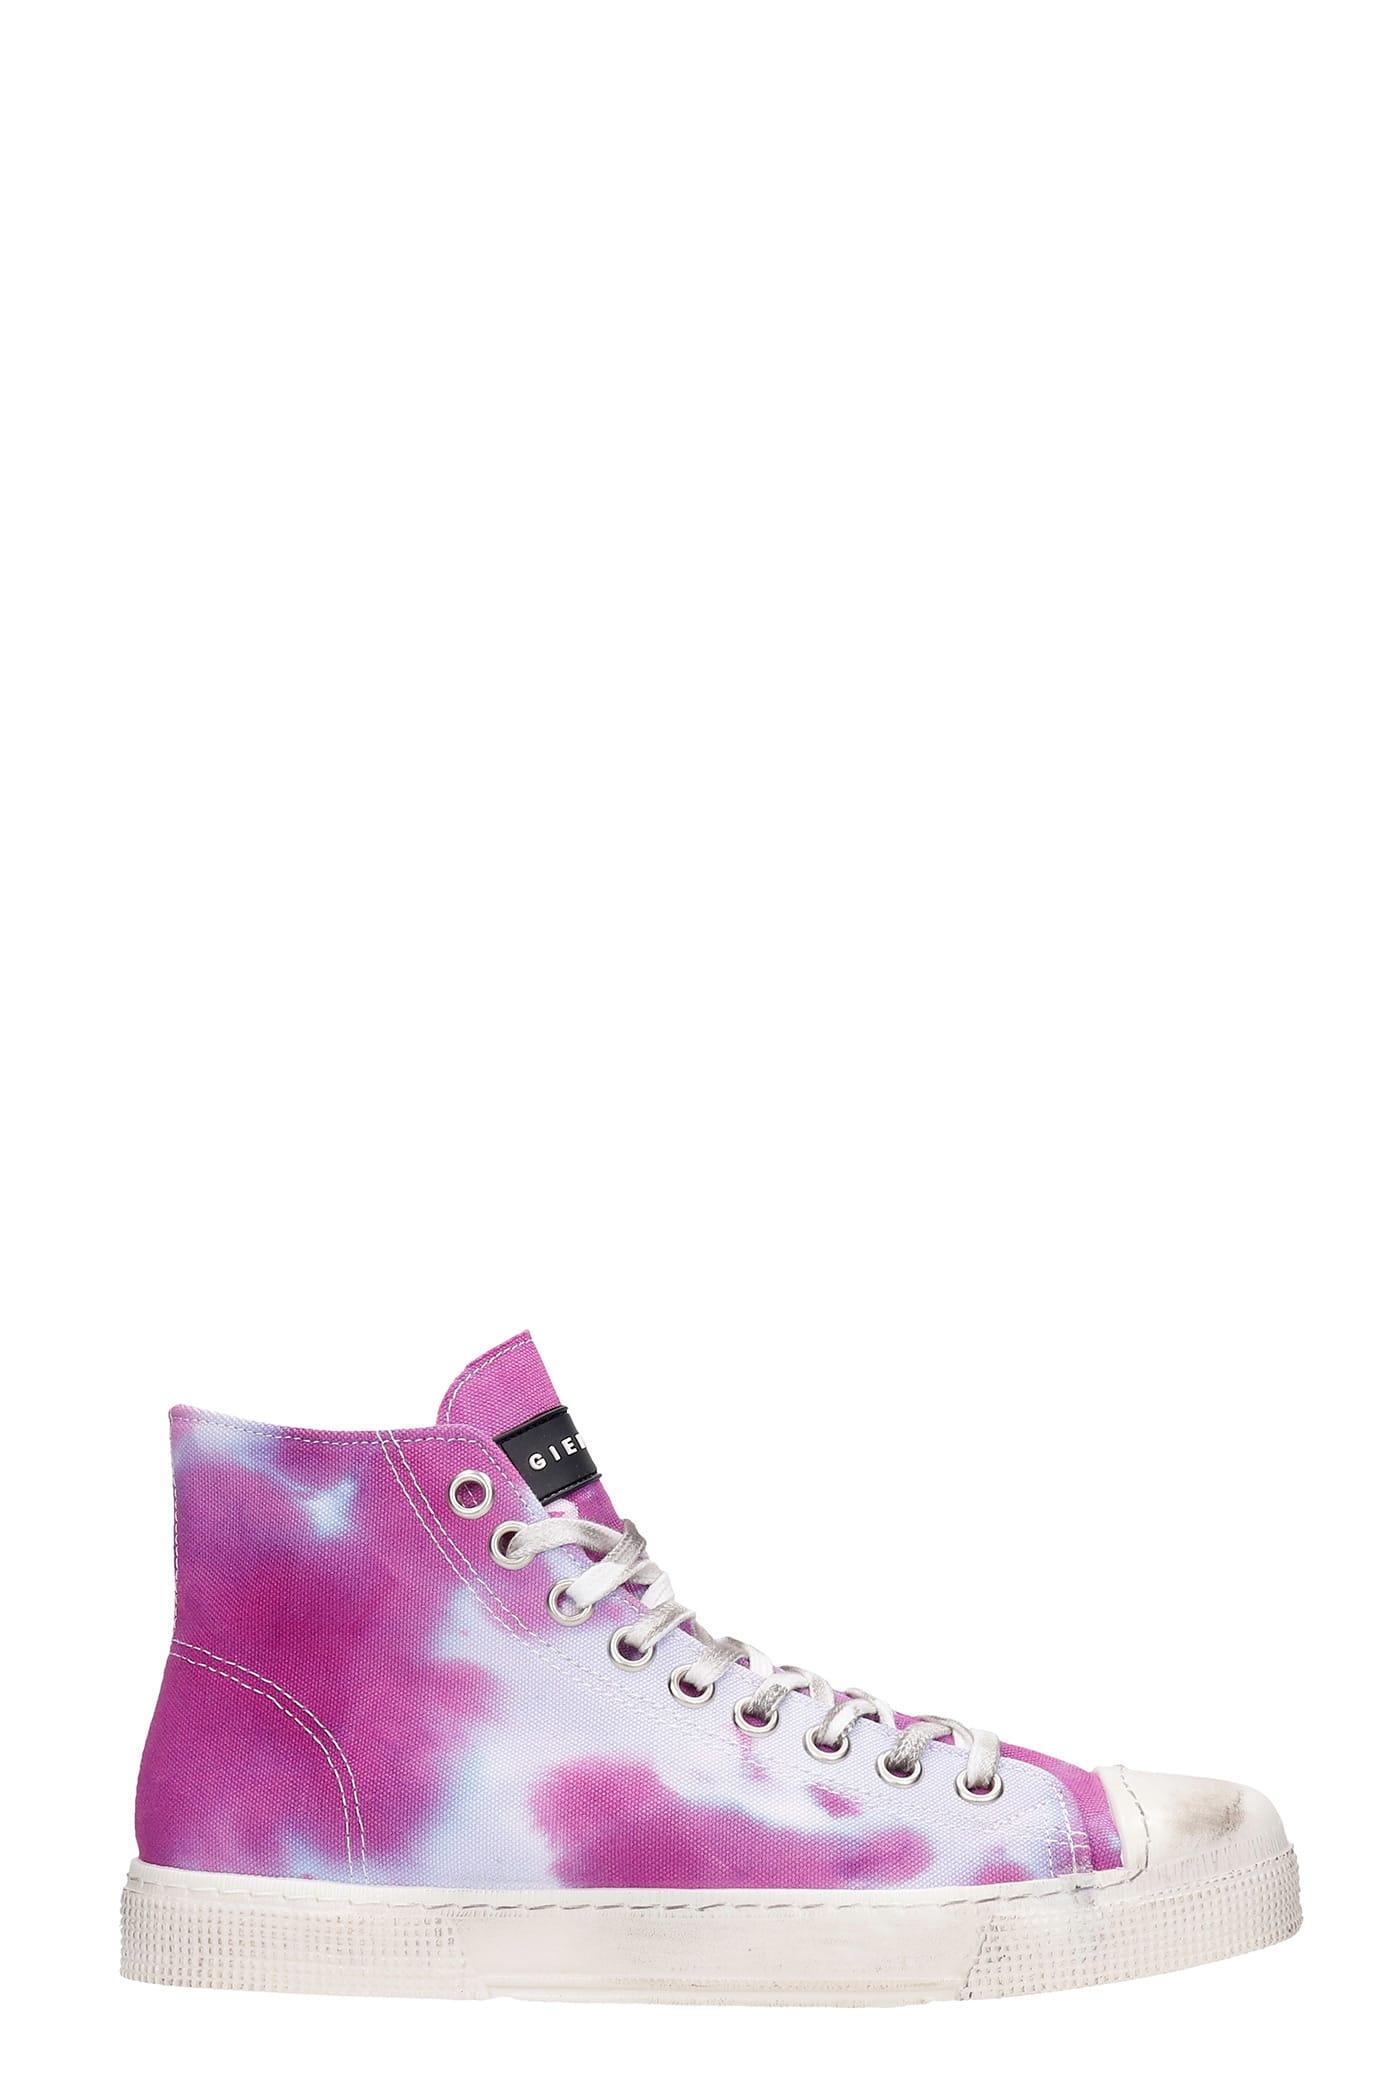 J.m. High Sneakers In Viola Canvas